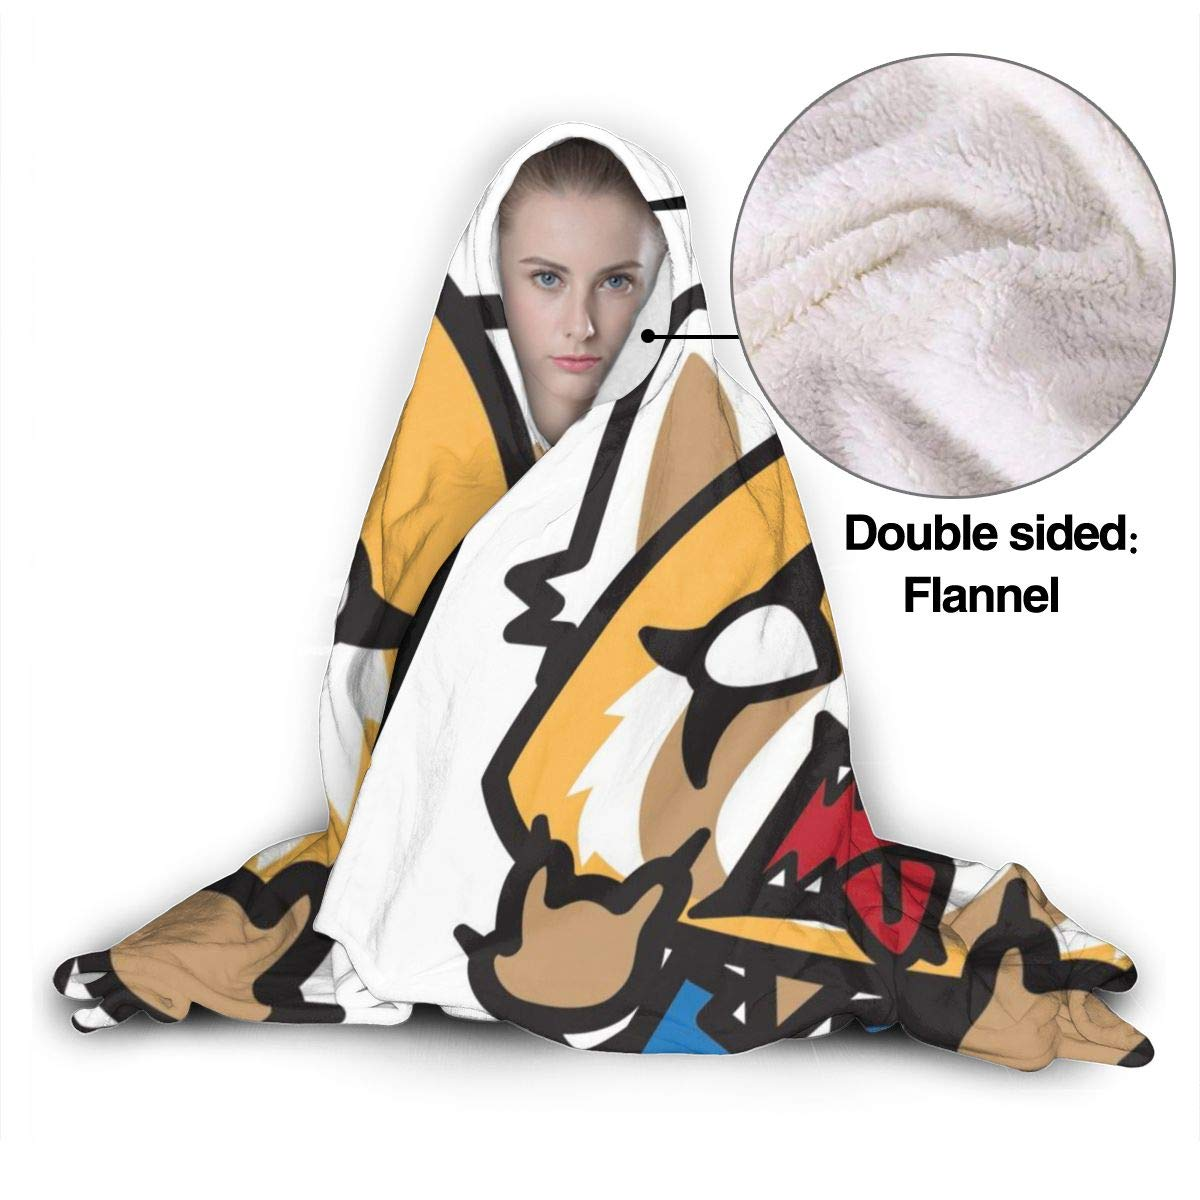 Silver Bullet Aggretsuko Retsuko Wearable Hooded Blanket Hood Ultra Soft Micro Fleece Mens Women Blanket Hooded Fuzzy Lightweight Plush Bed Couch Living Room 50x40